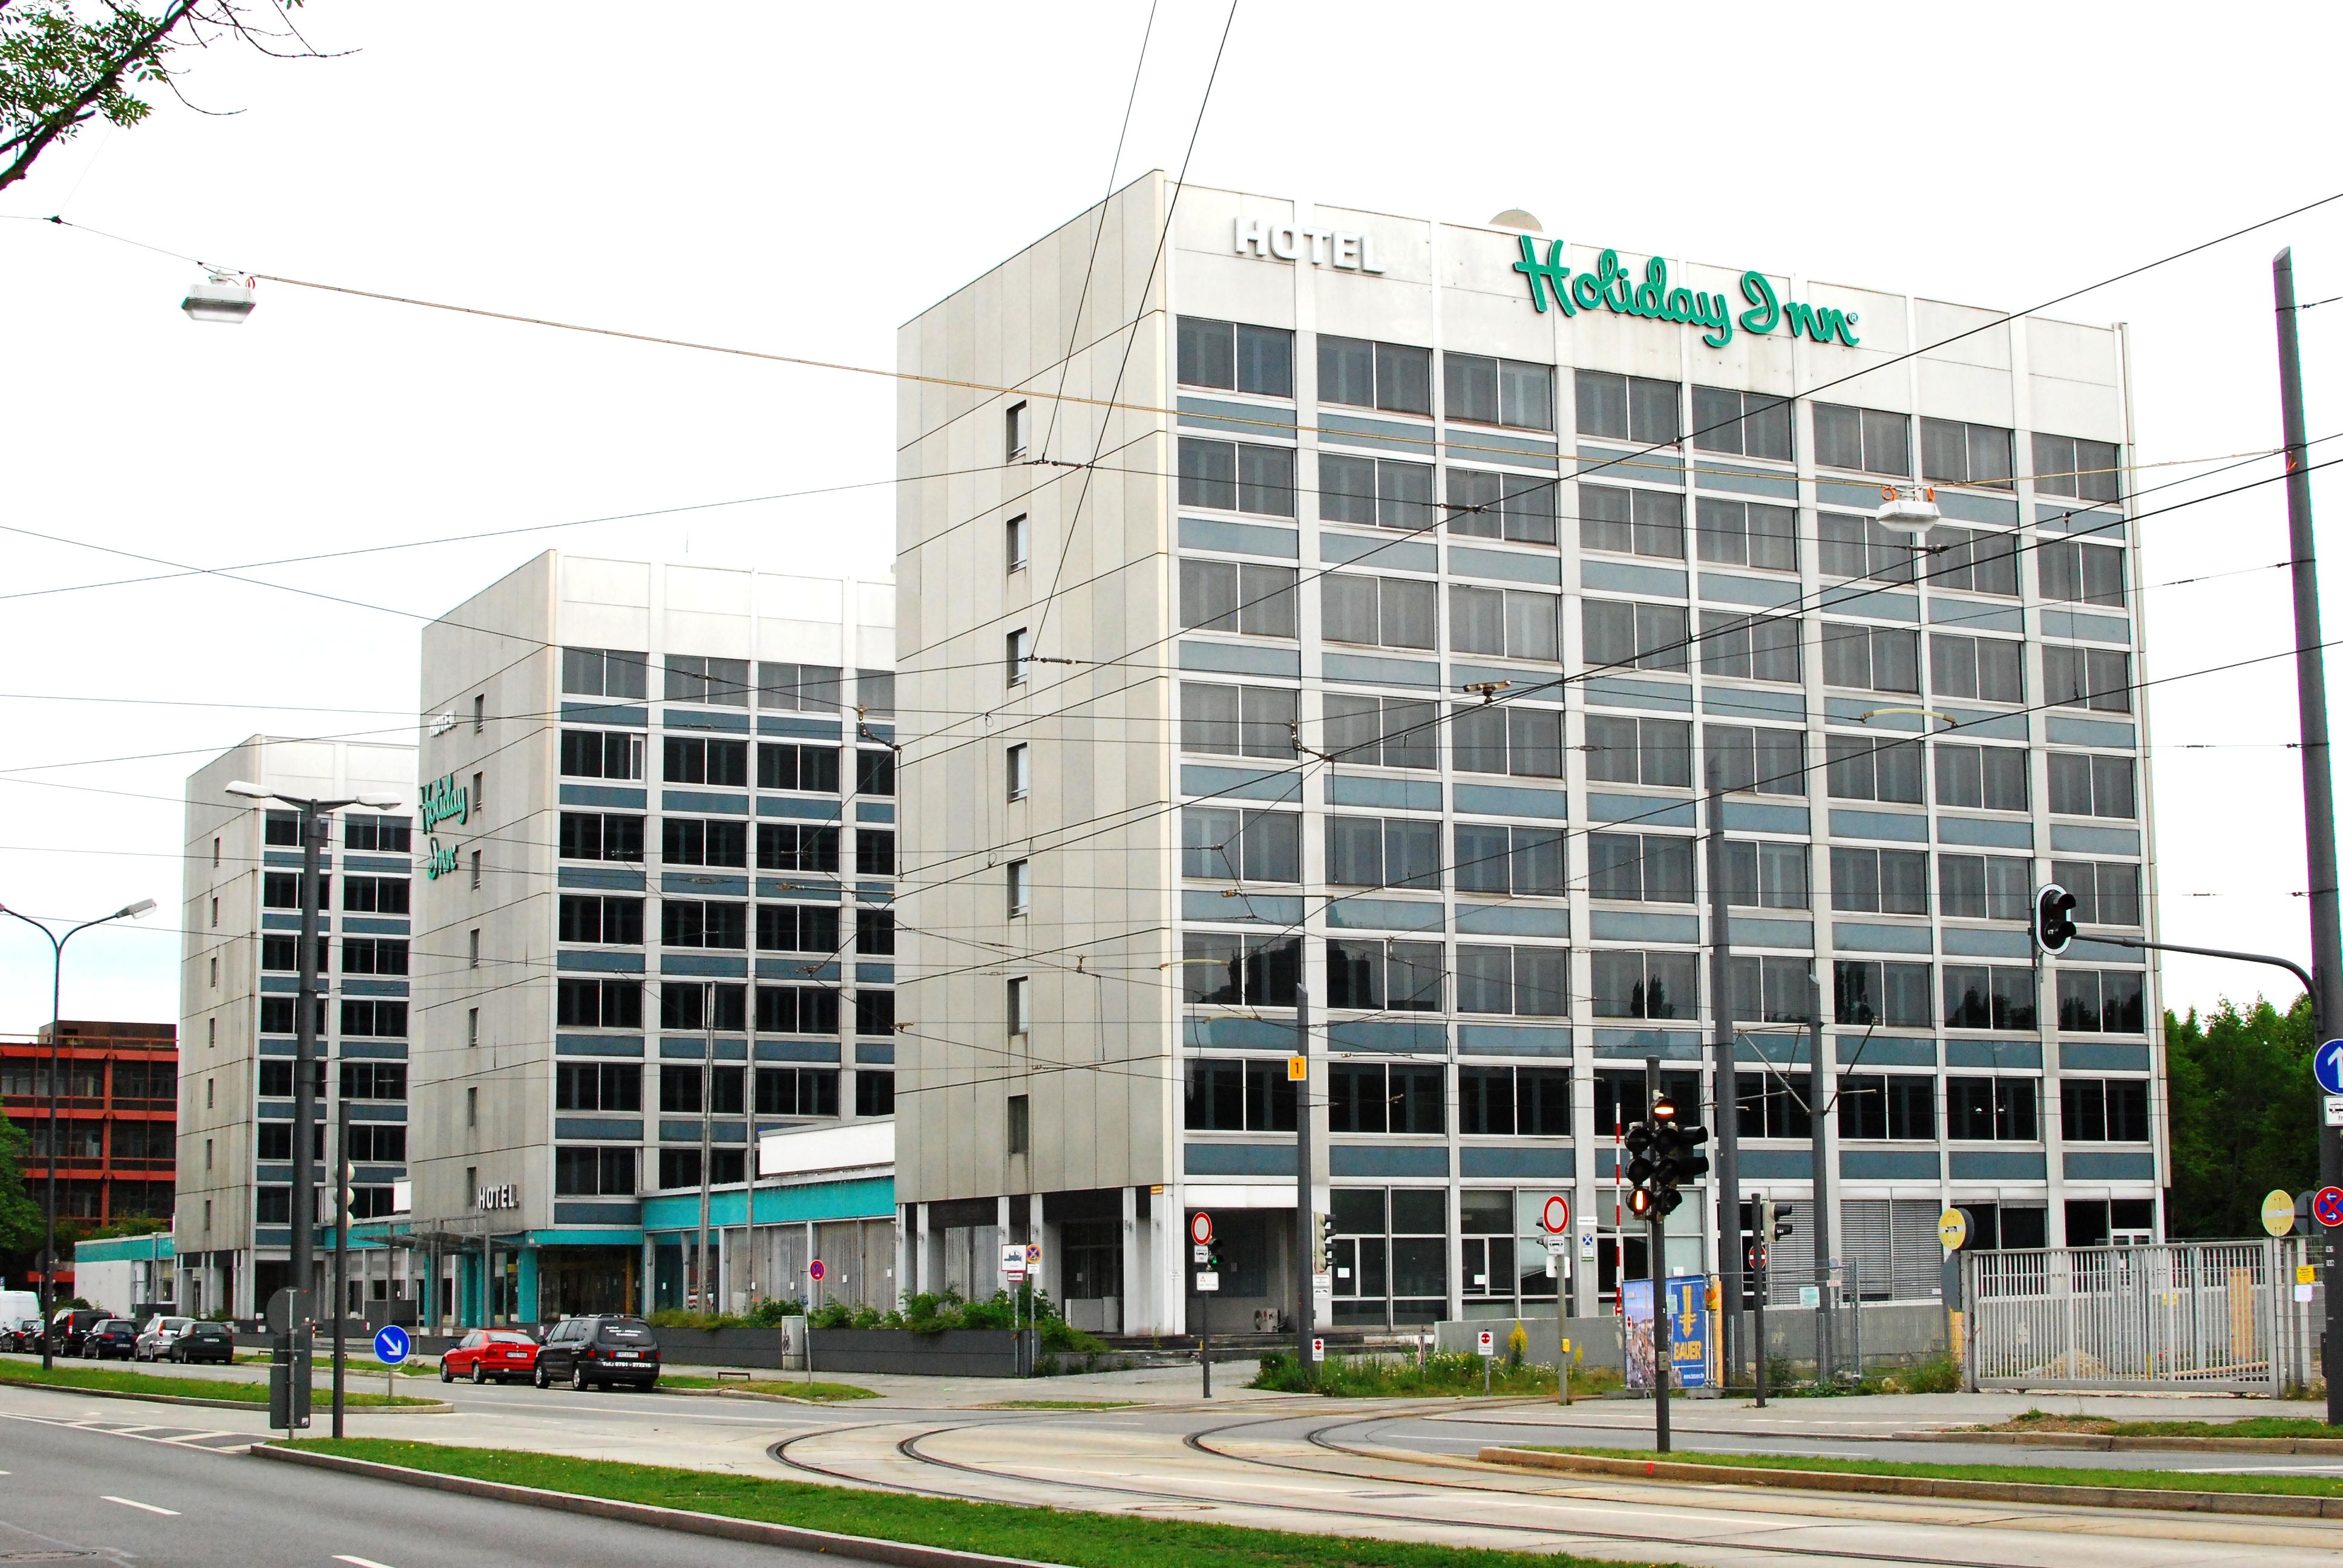 Holiday Inn Hotels In Orlando Florida Near Disney World